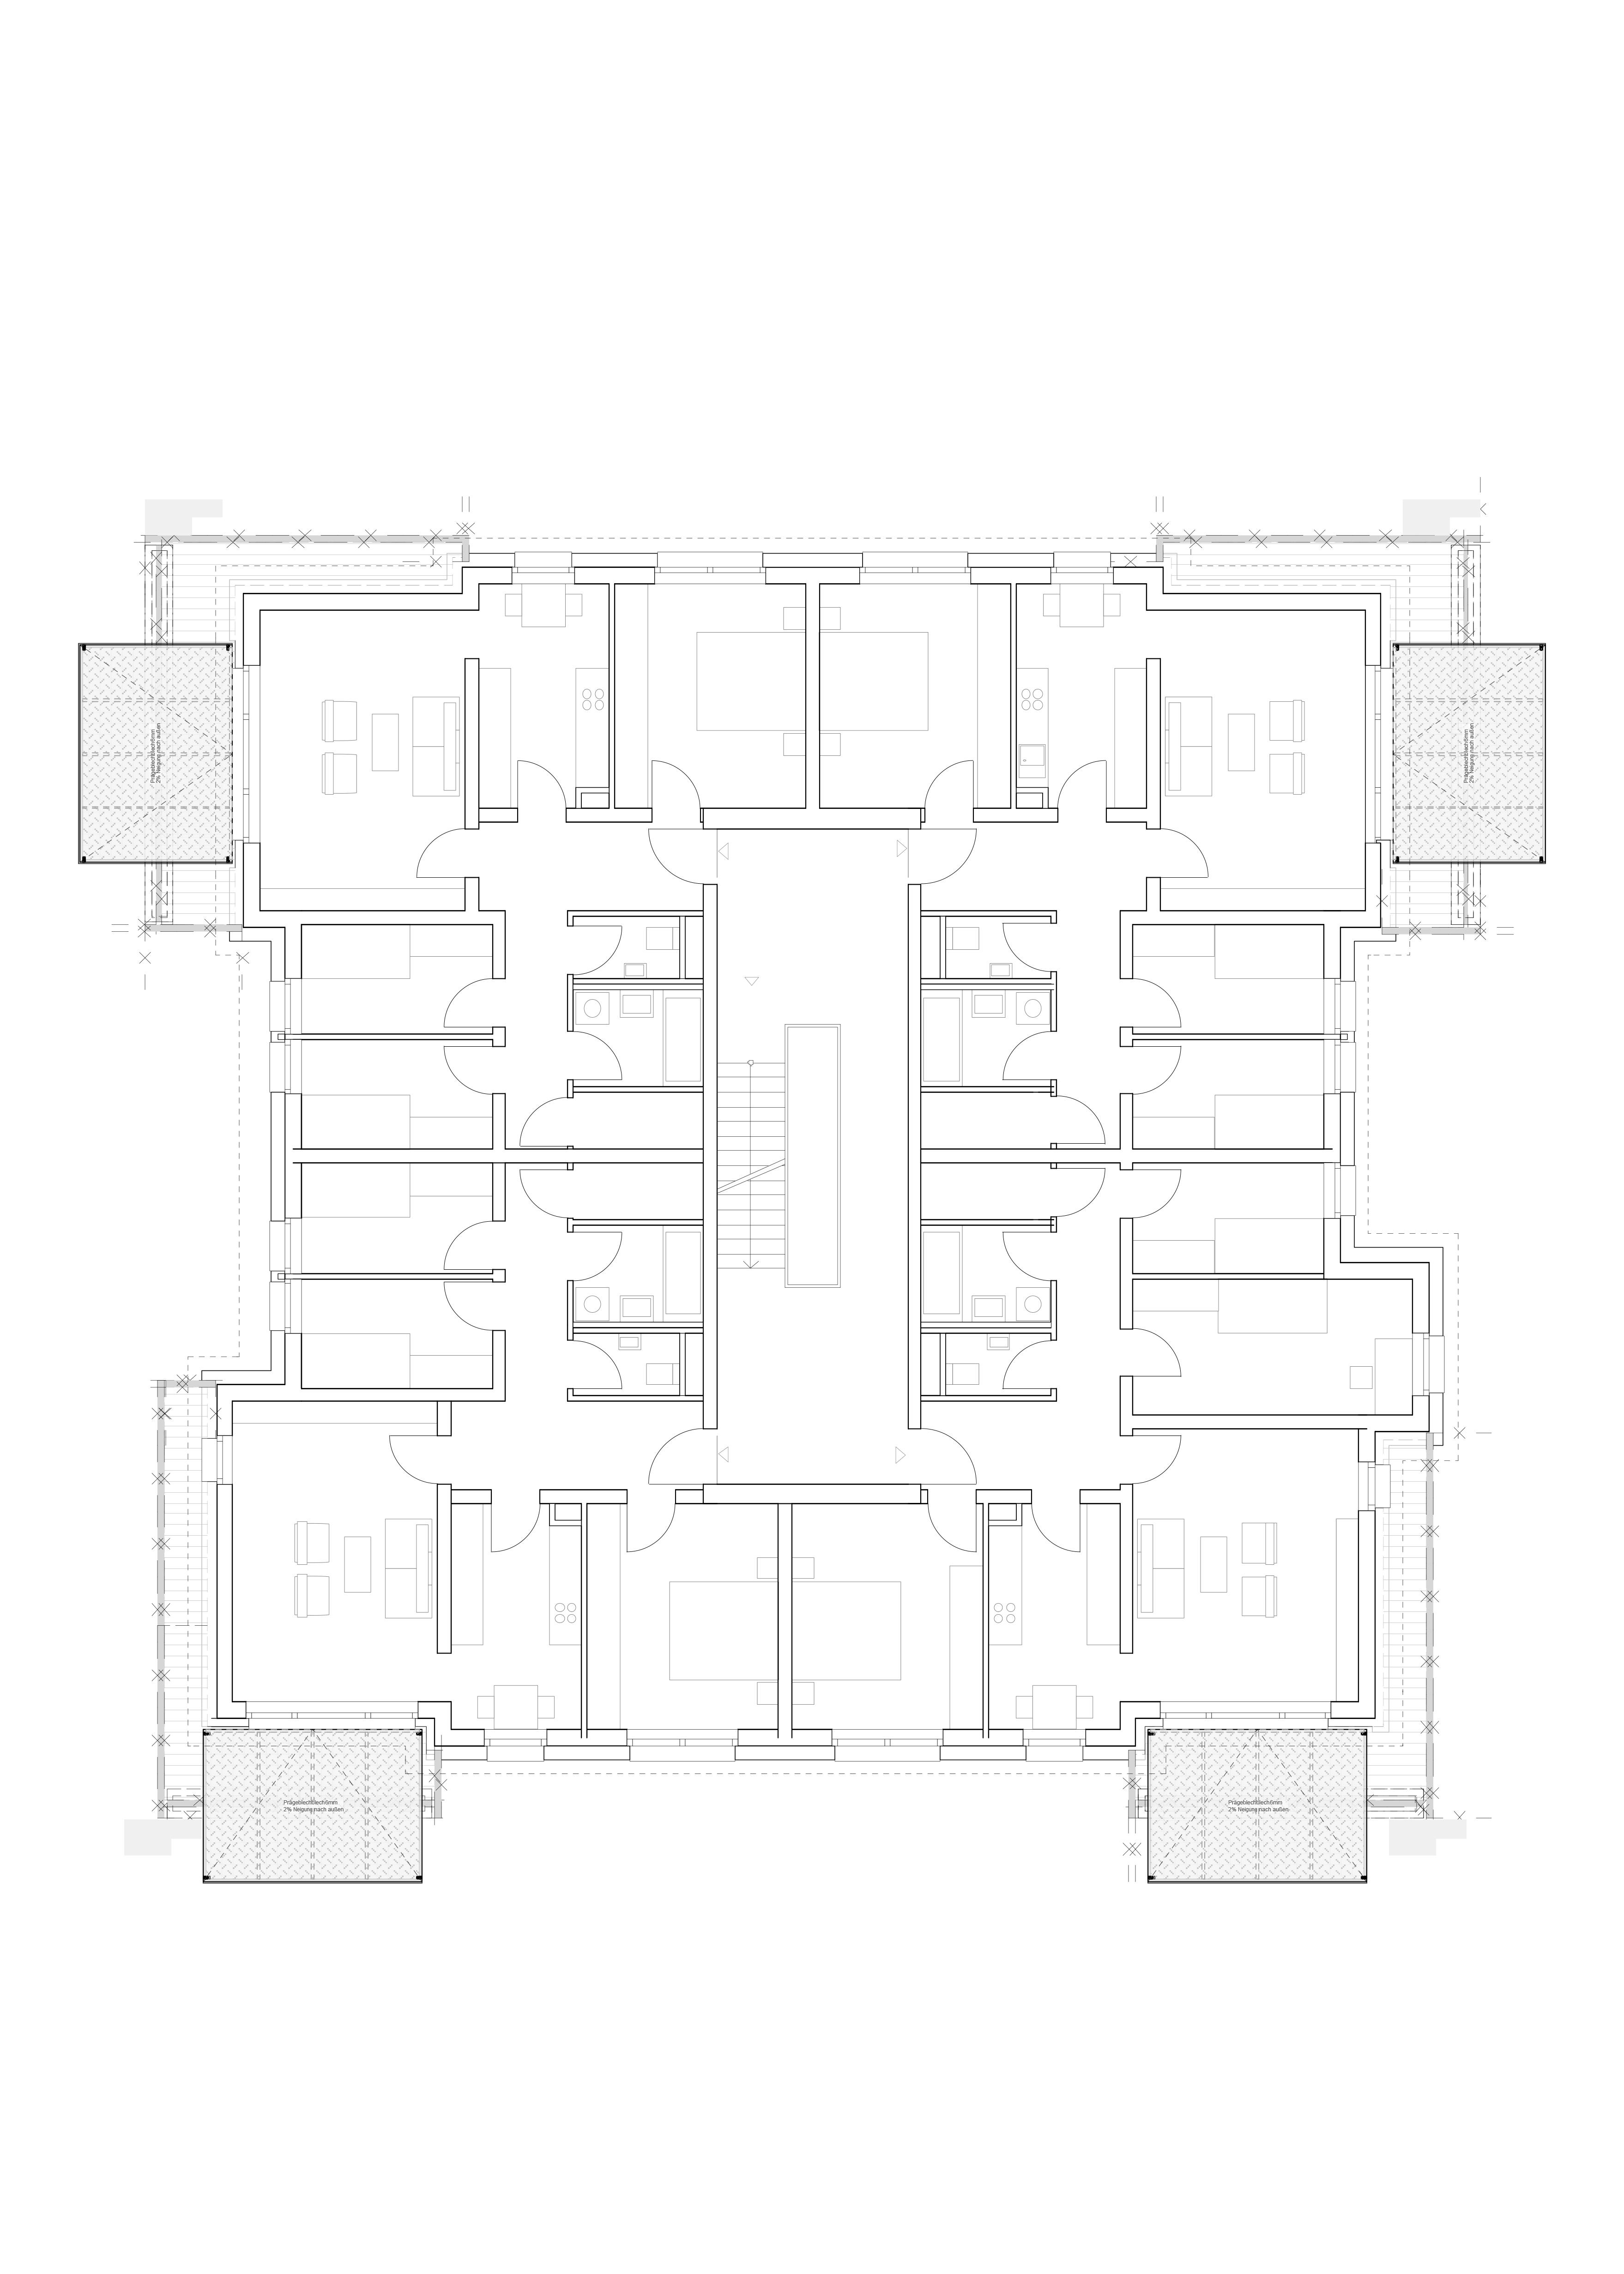 Haus 03 - Regelgeschoß